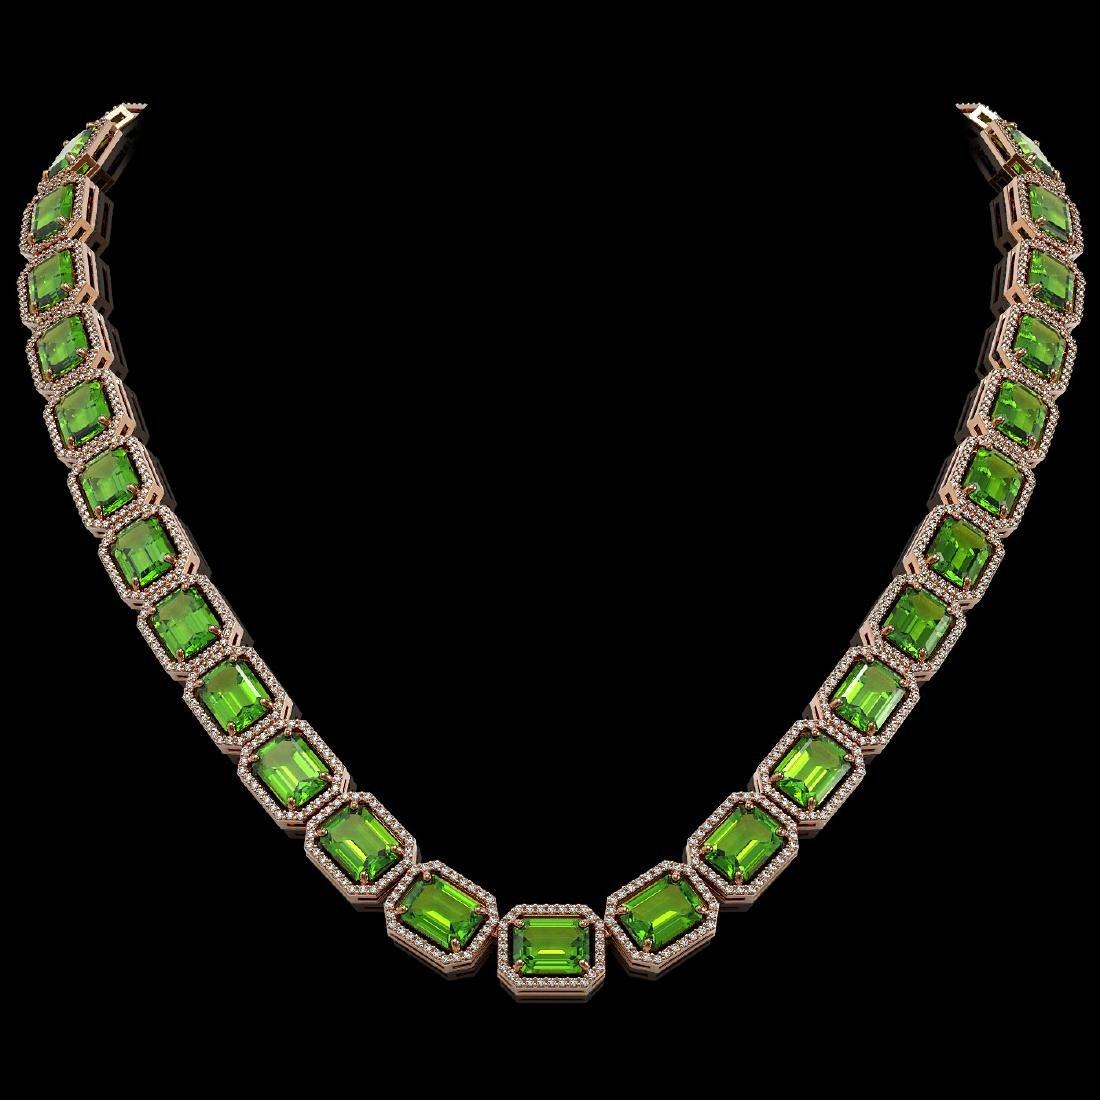 73.41 CTW Peridot & Diamond Halo Necklace 10K Rose Gold